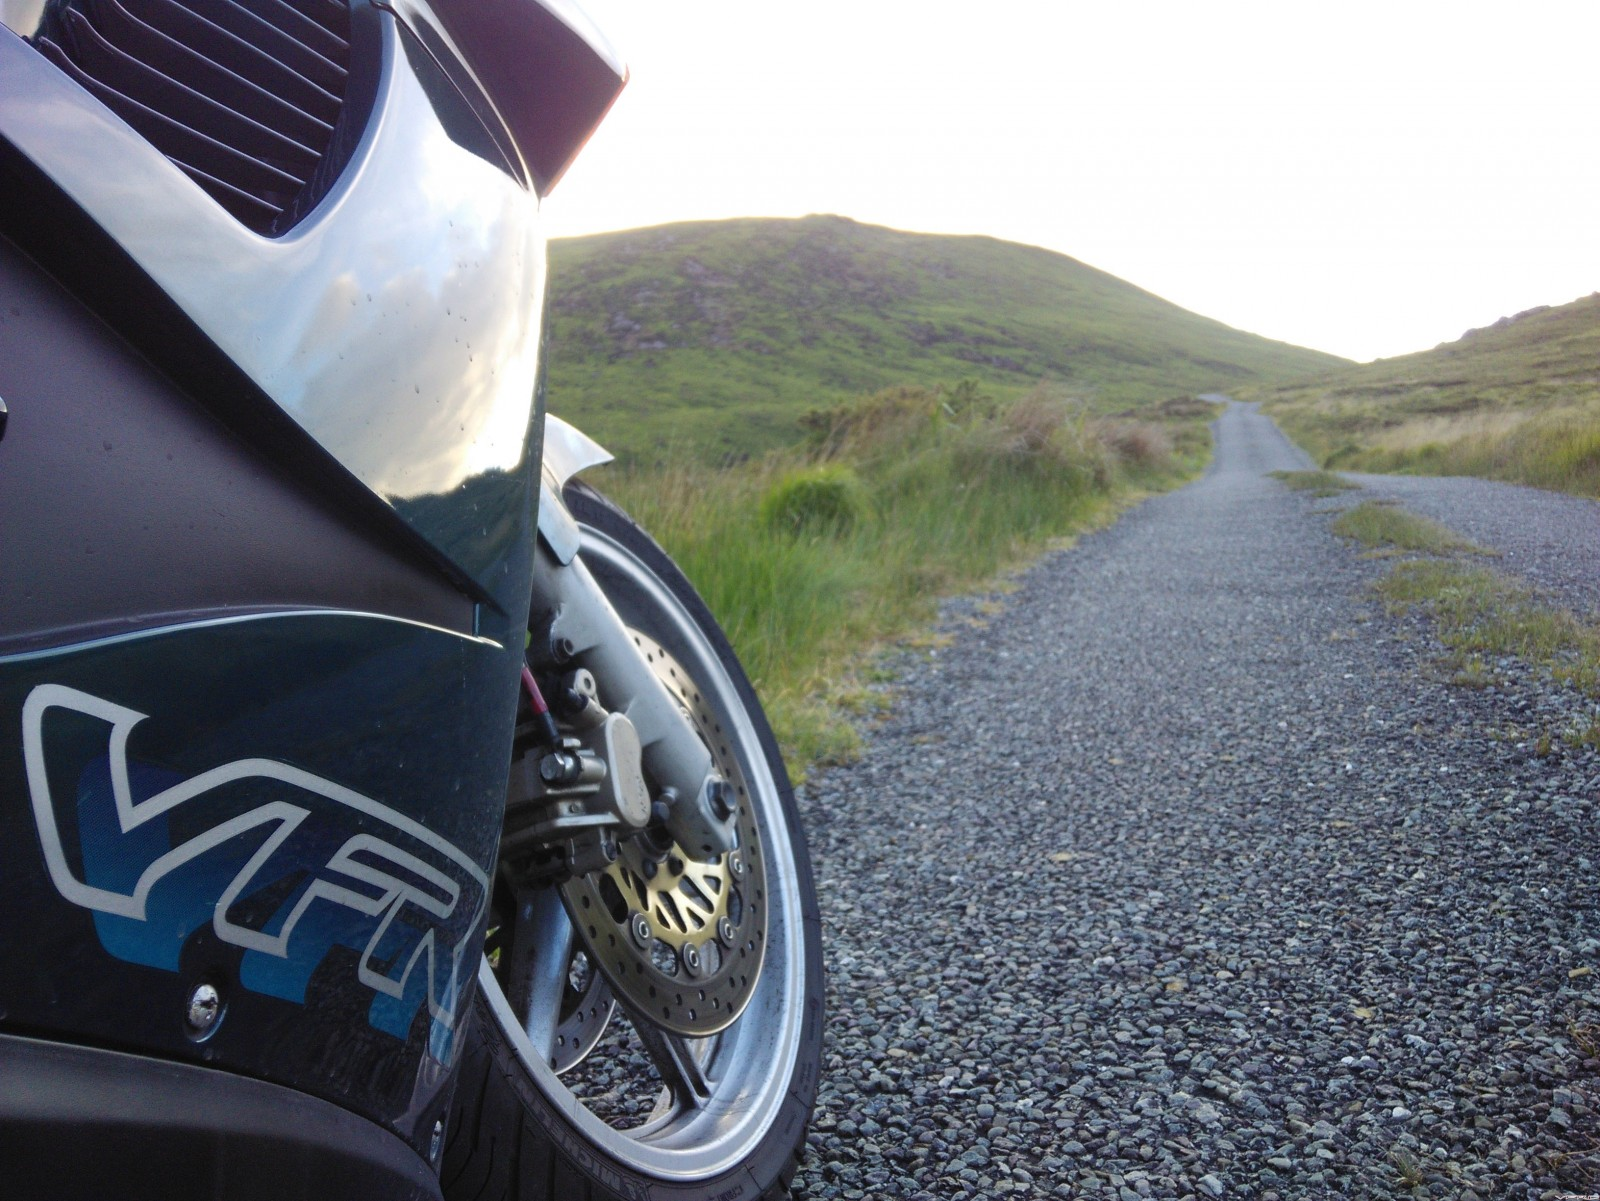 VFR Trip to Kerry, Ireland